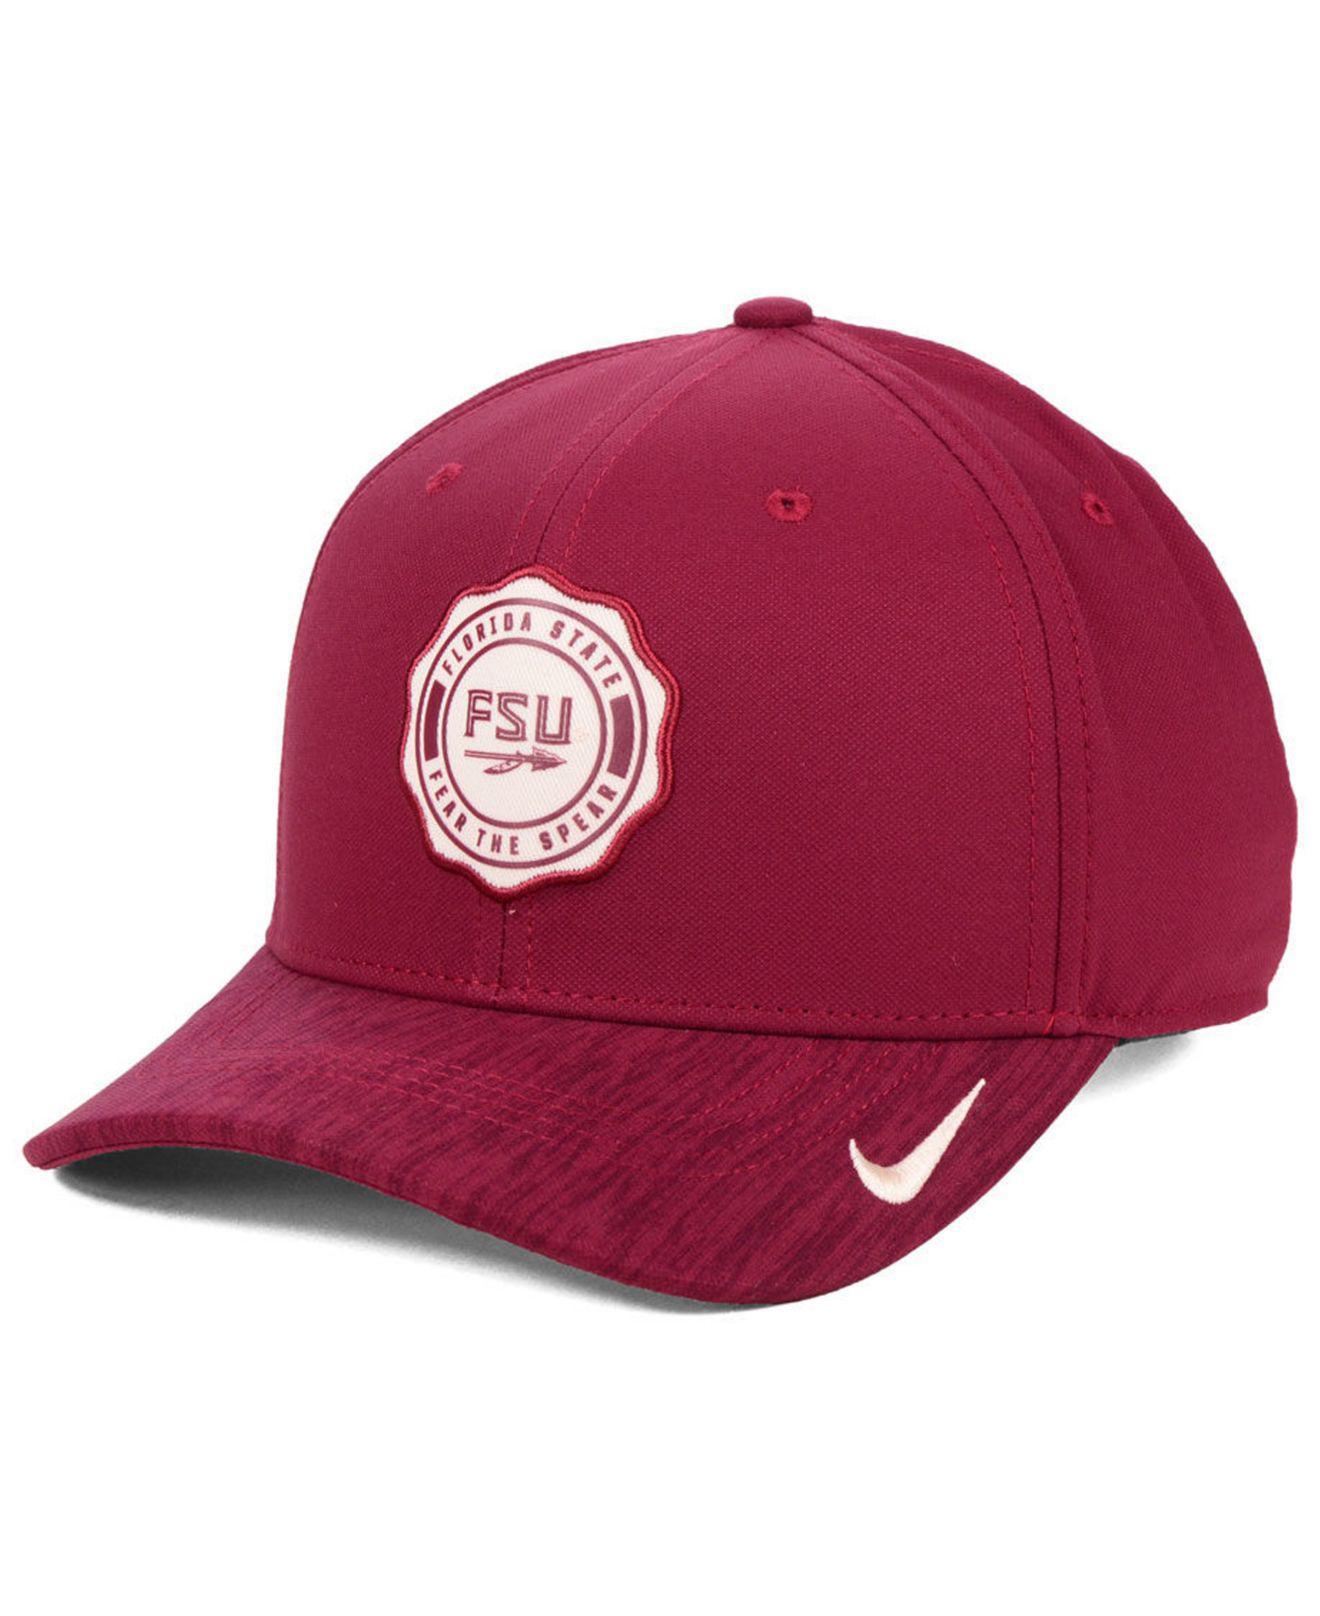 buy online 228d2 def0c Nike. Men s Red Florida State Seminoles Rivalry Swooshflex Stretch Fitted  Cap